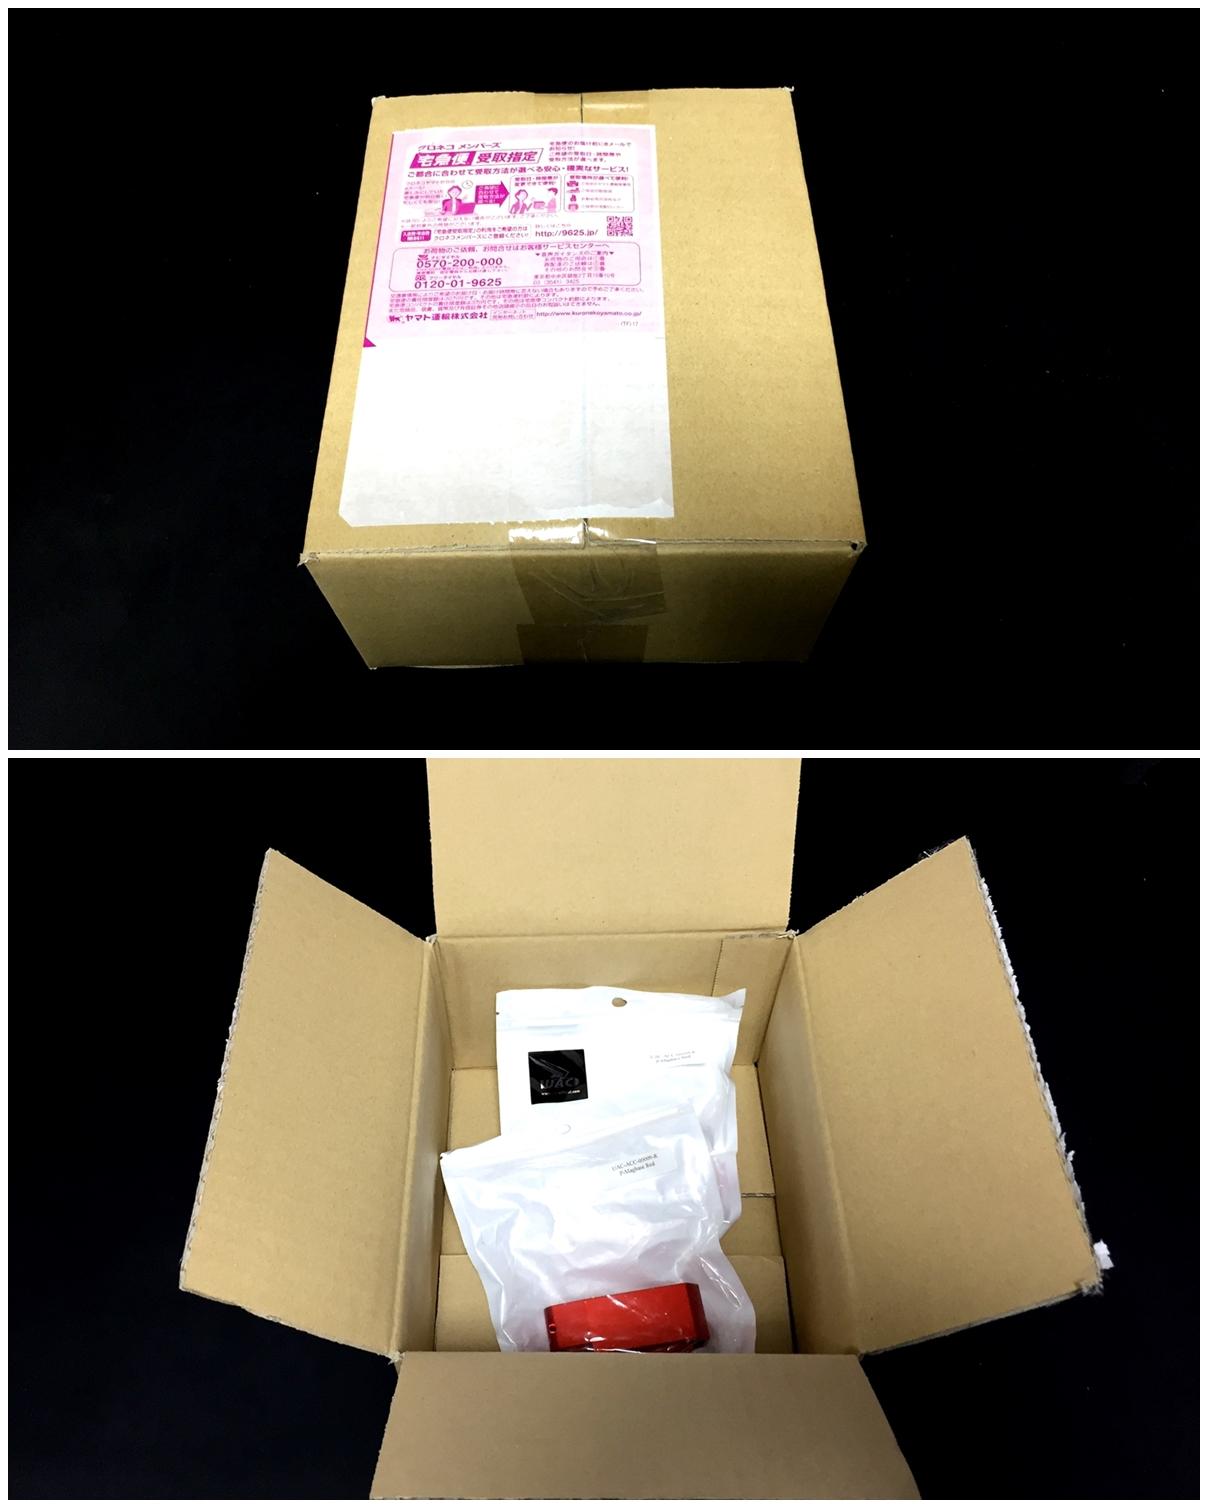 1 UAC P-MAG TTI TYPE アルミ ベース パッド 追加 購入 & TTI NOVESKE DIY LASER 刻印 加工 取付 レビュー